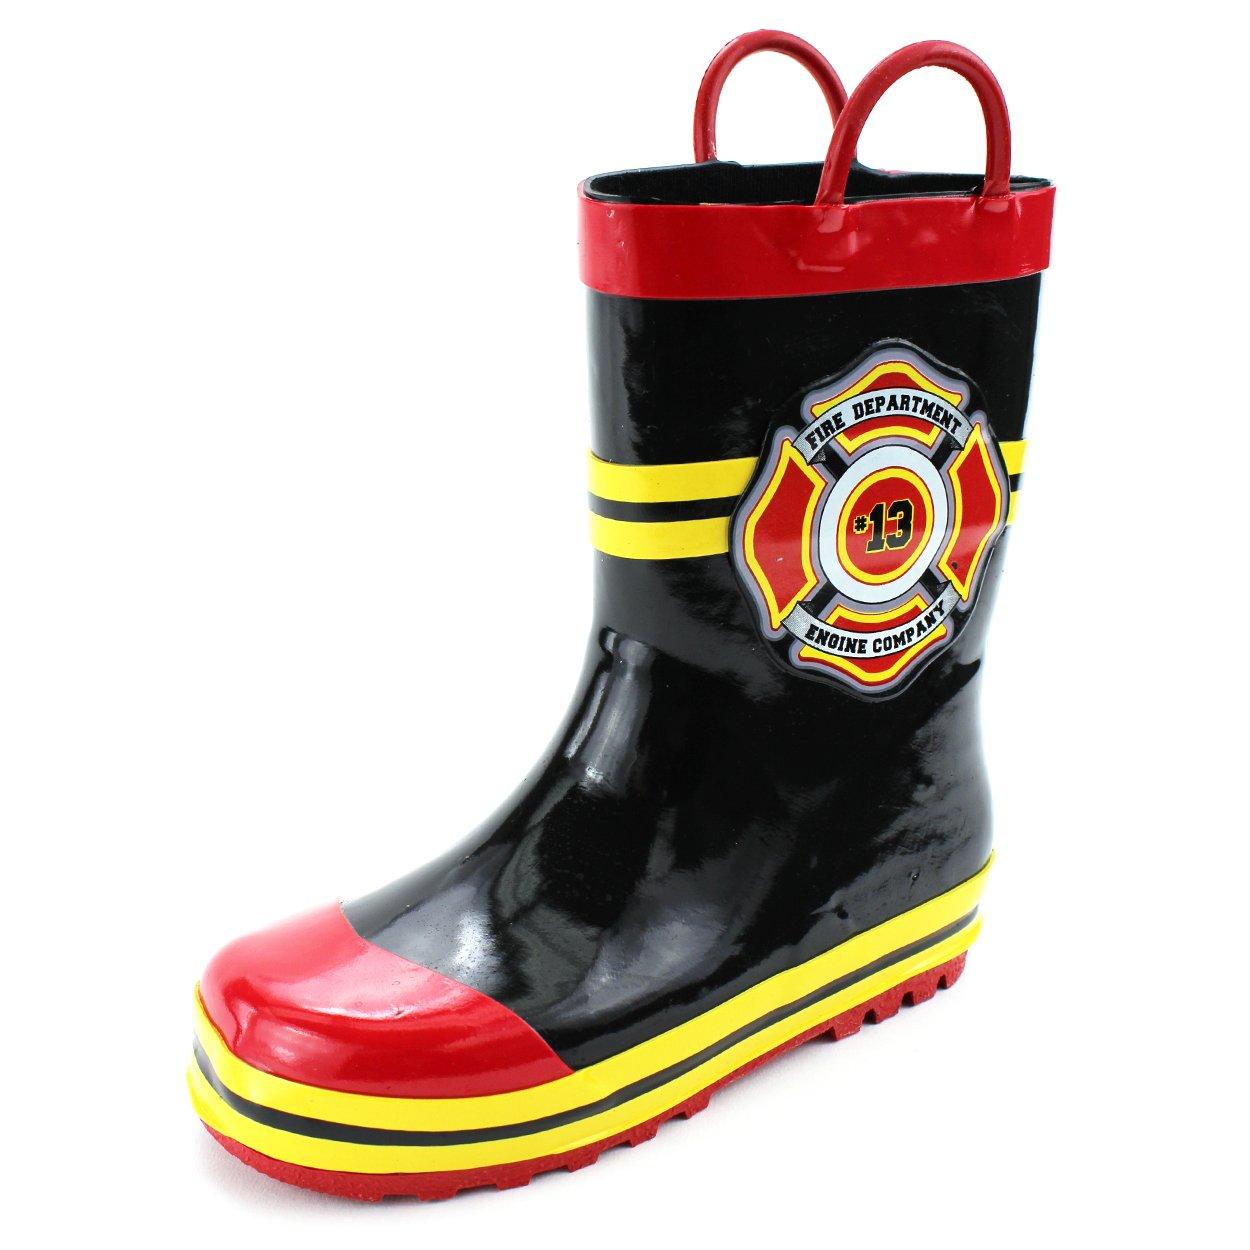 Fireman Kids Firefighter Costume Style Rain Boots (9/10 M US Little Kid, Fire Dept Black)